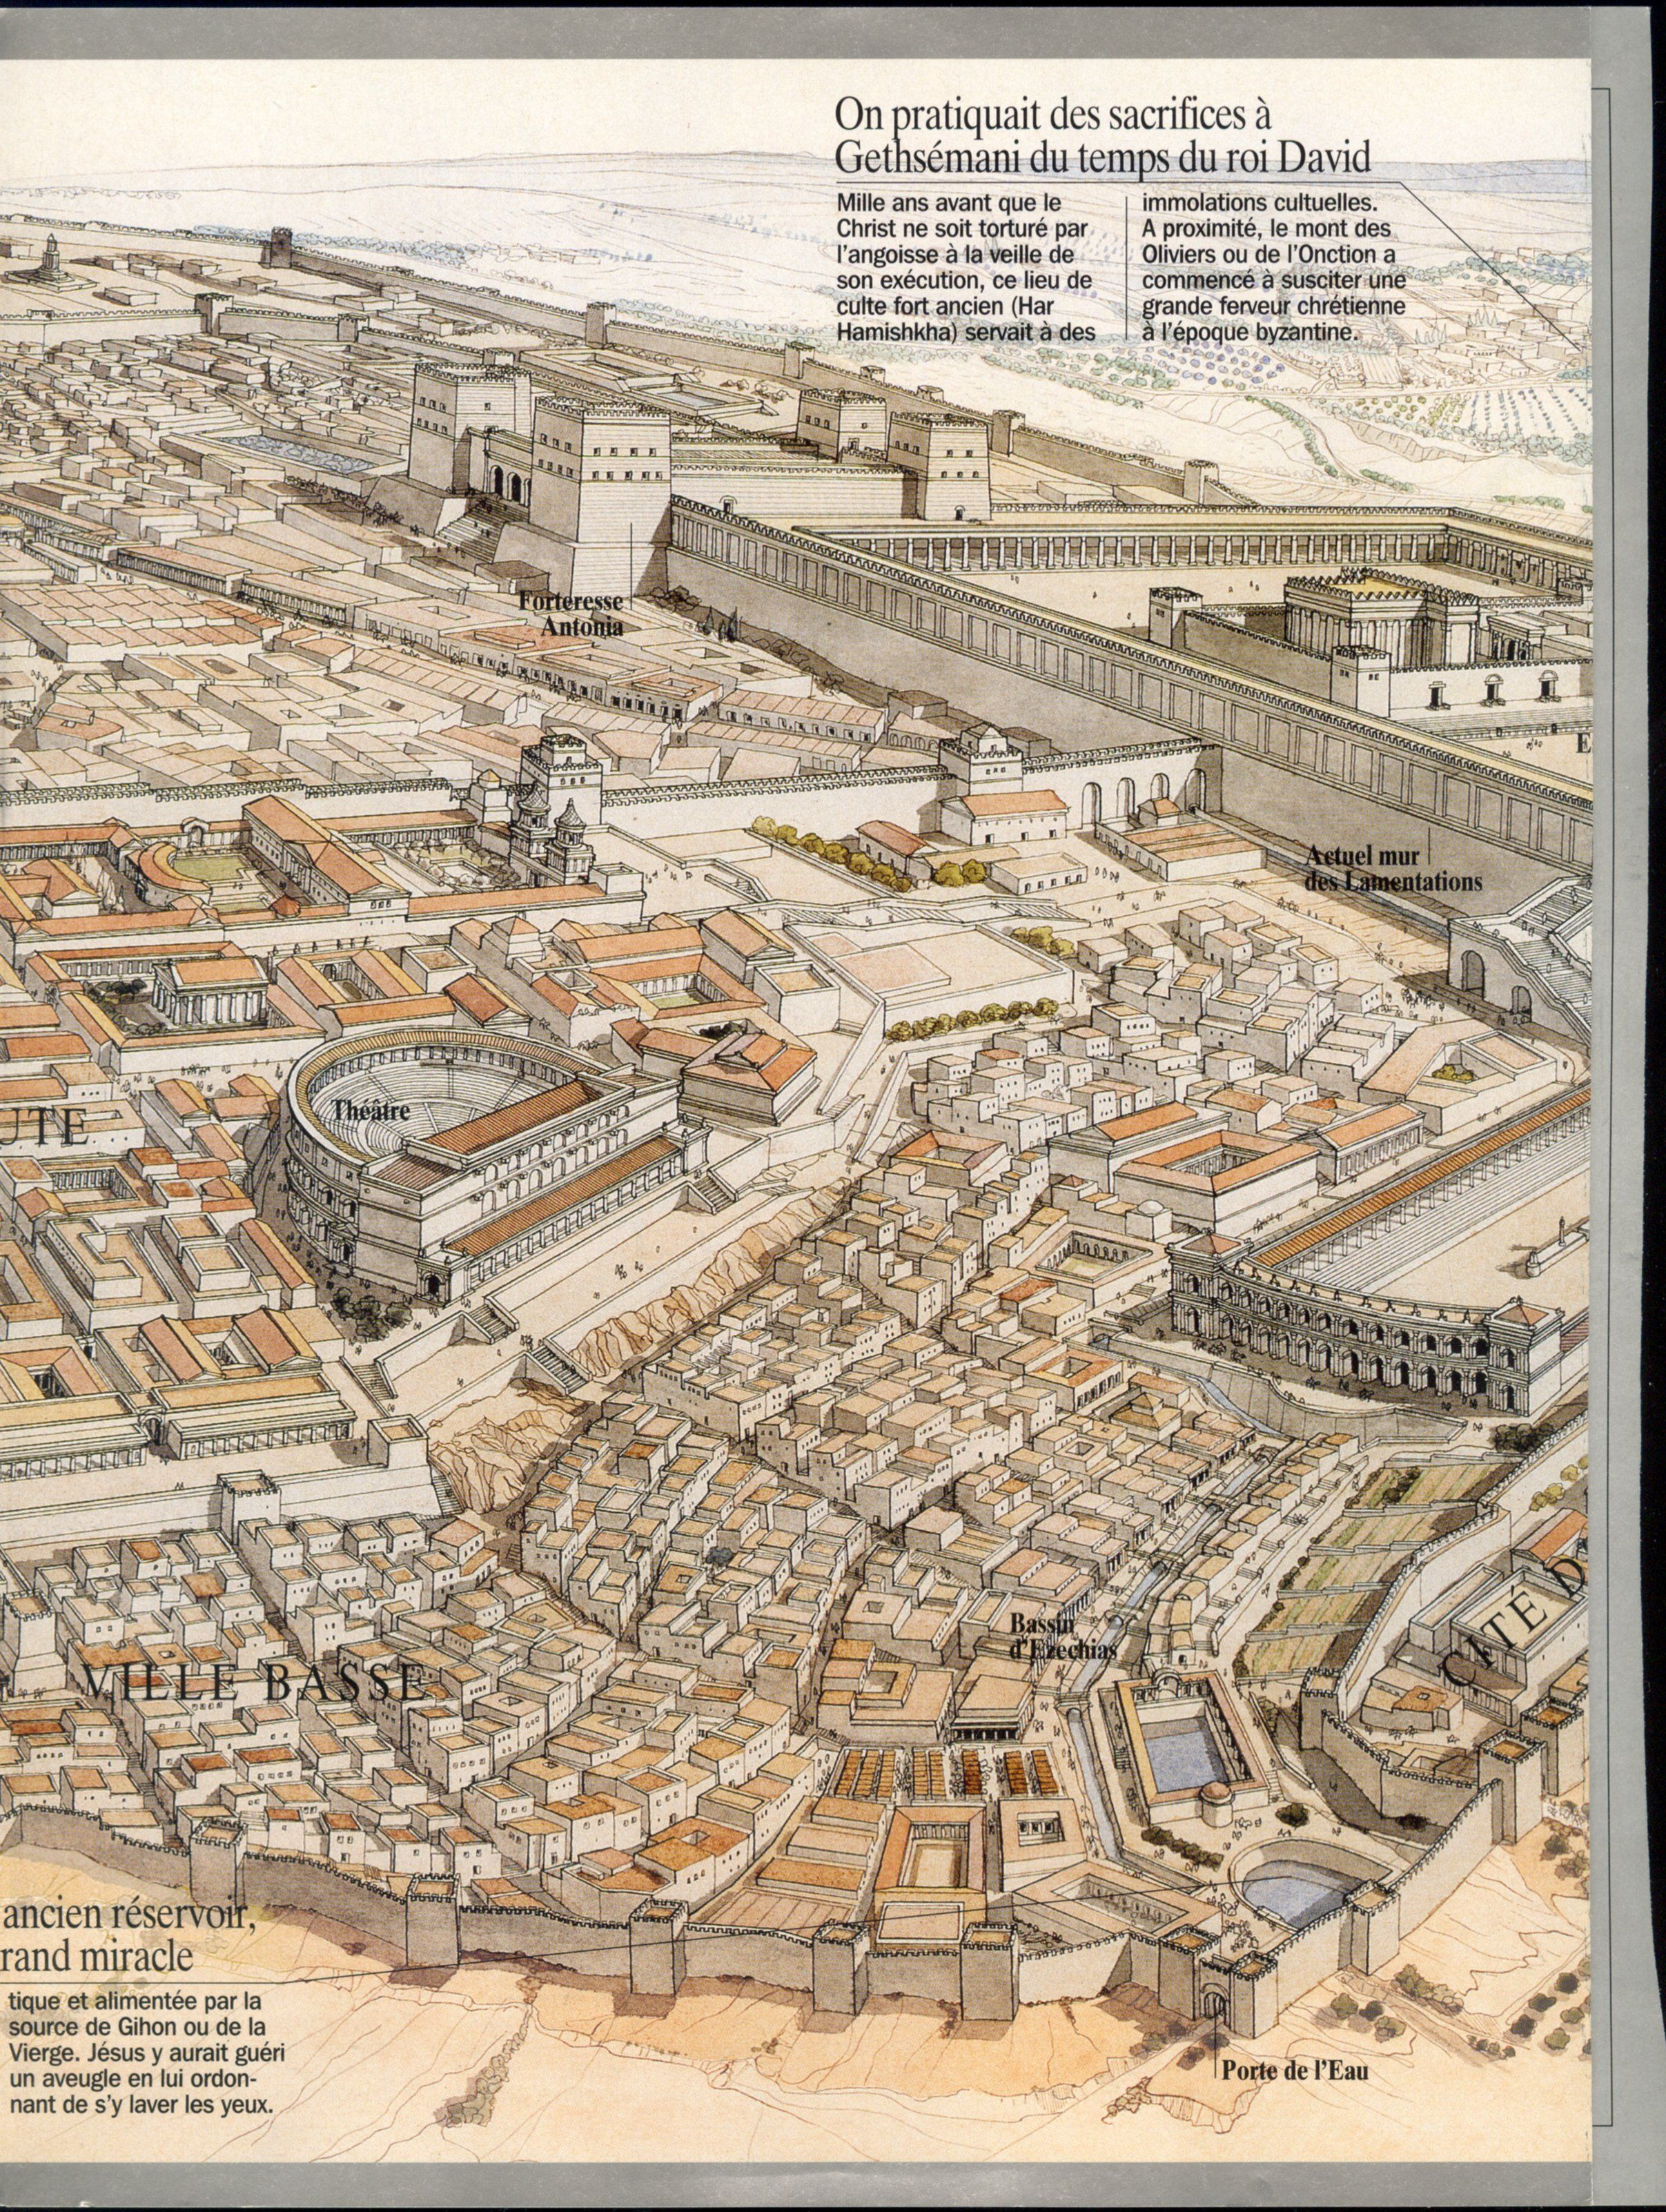 Jerusalem of Herod the Great (37 BC) J.C. Golvin Judea